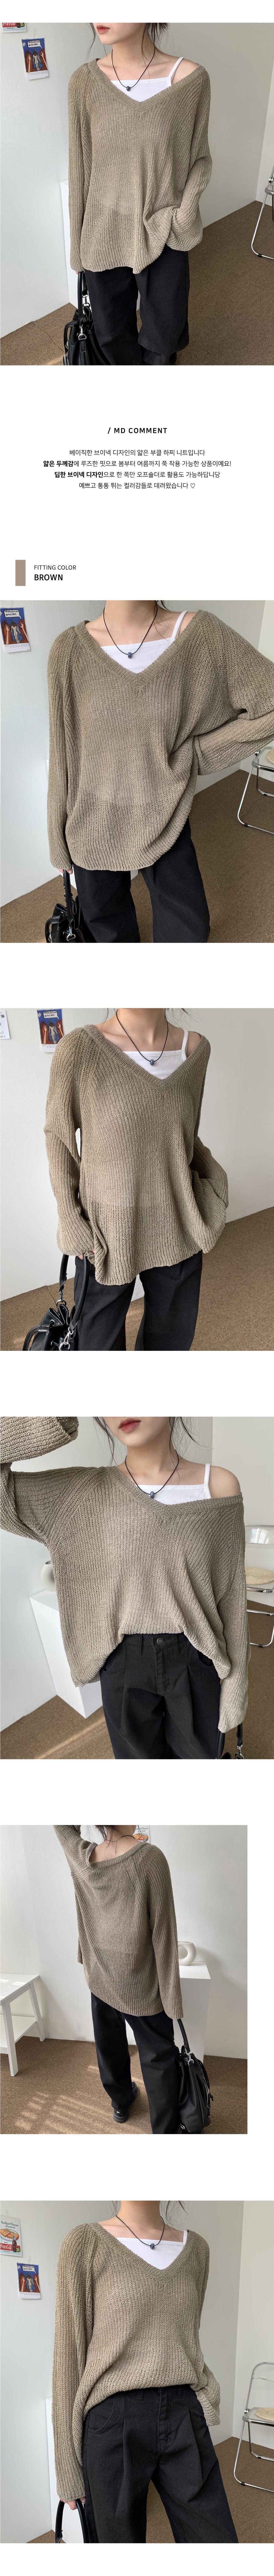 Rosy Deep V-Neck Hatchi Knitwear